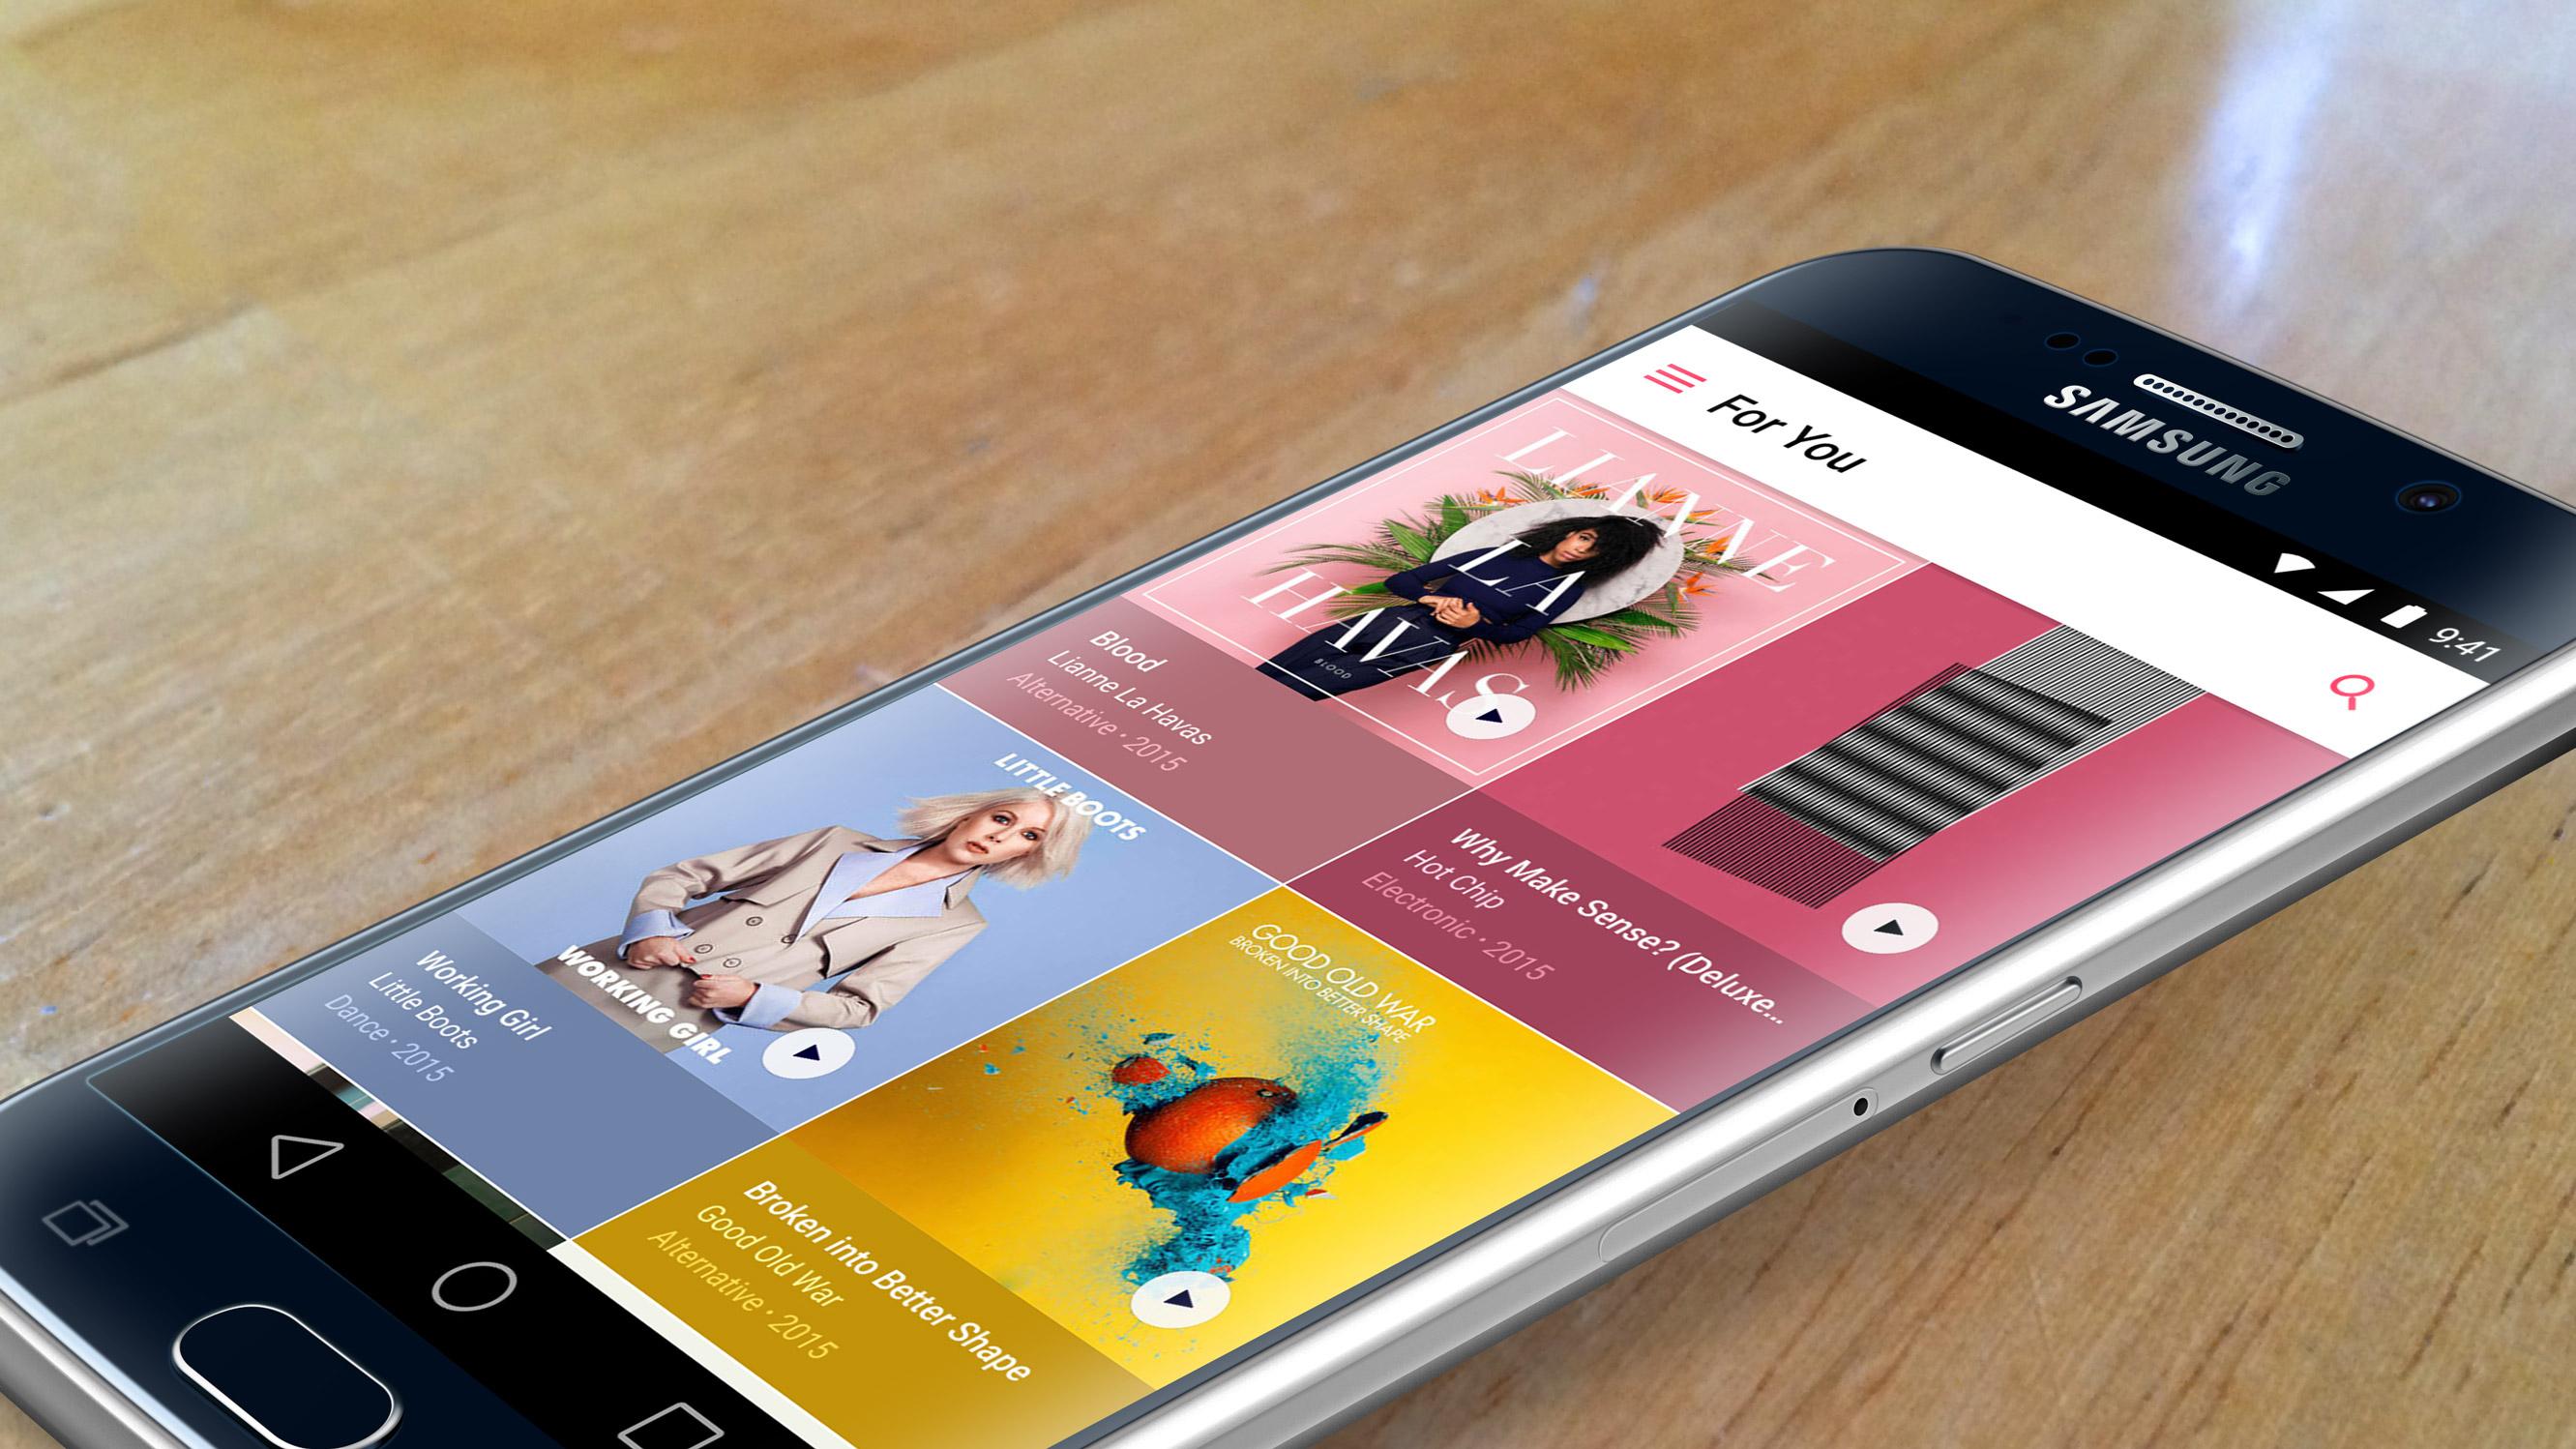 Apple Music prochainement compatible Chromecast sous Android